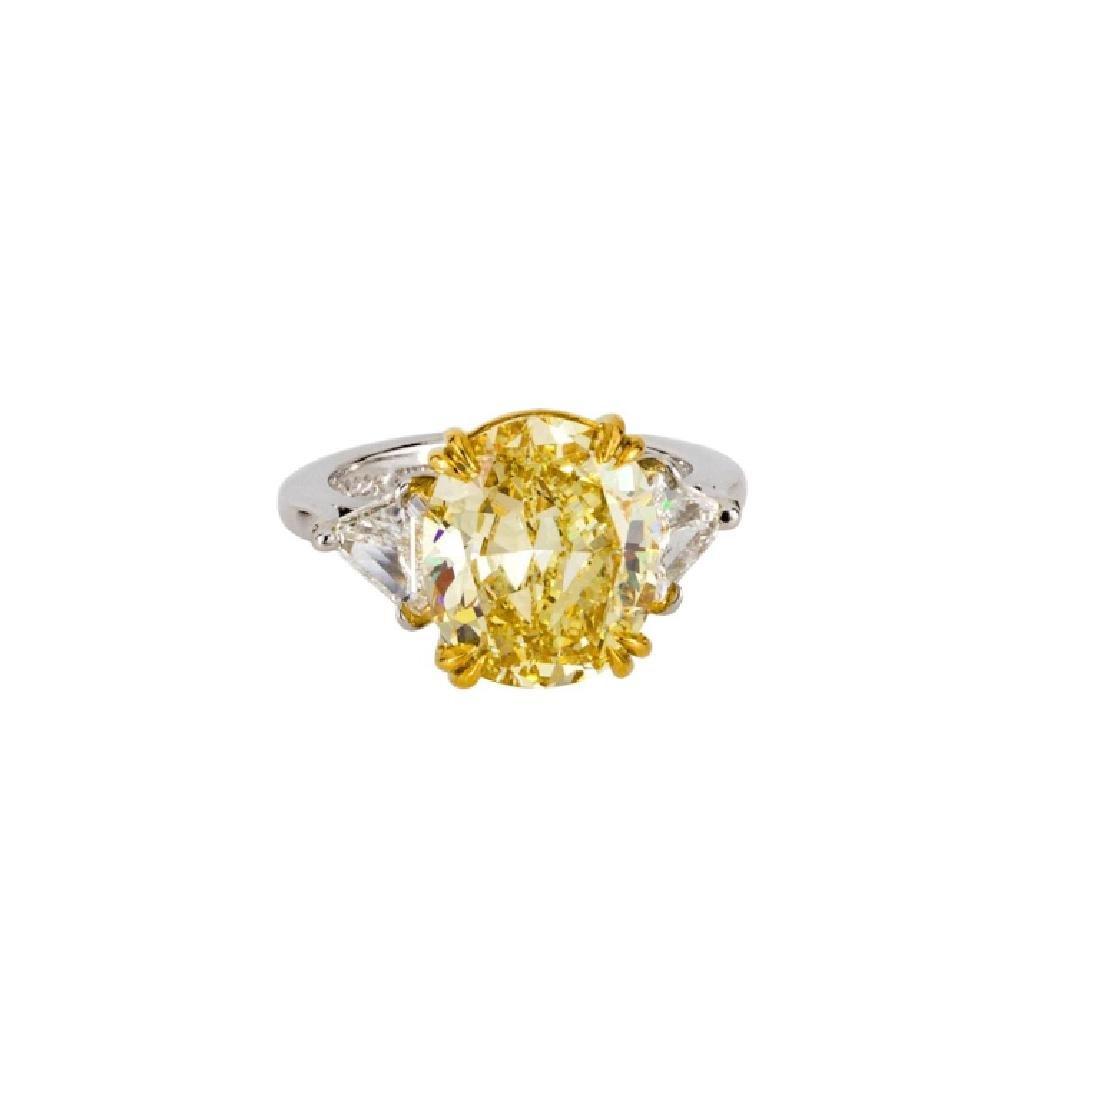 GIA Certified 5.25 Carat Fancy Yellow Diamond Ring